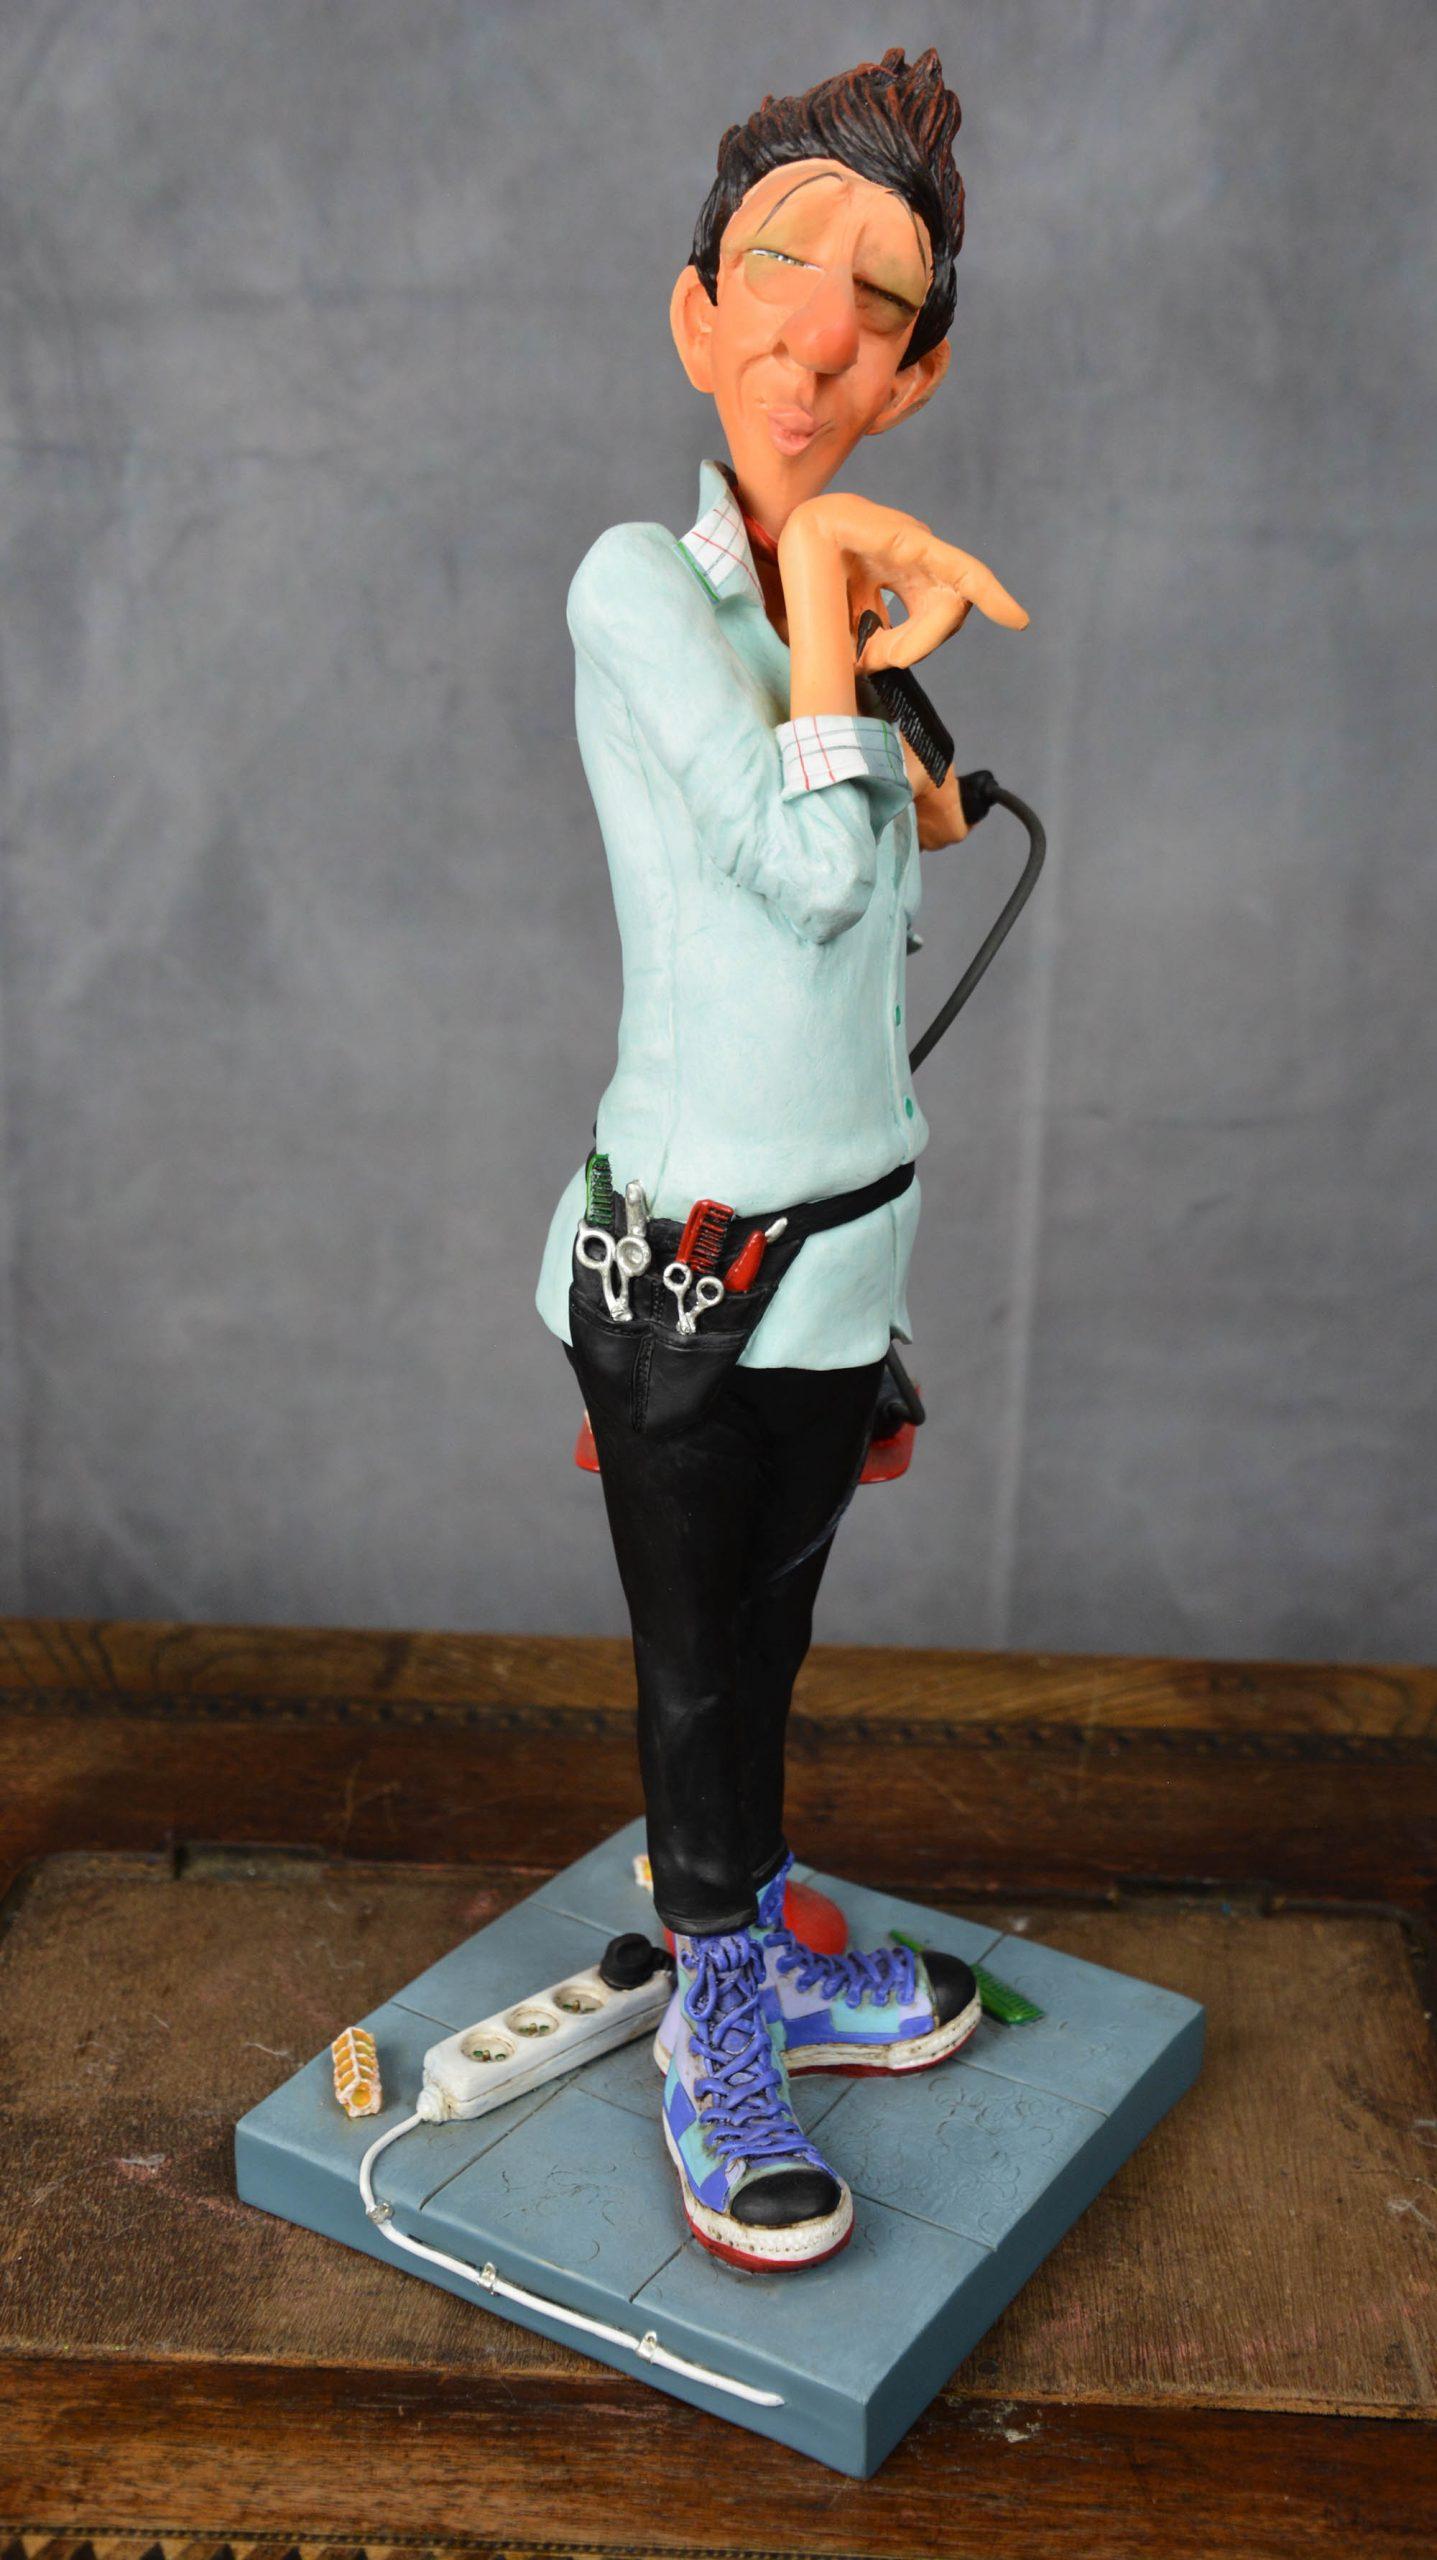 boutique figurine piece artisanale personnage coiffeur parodie